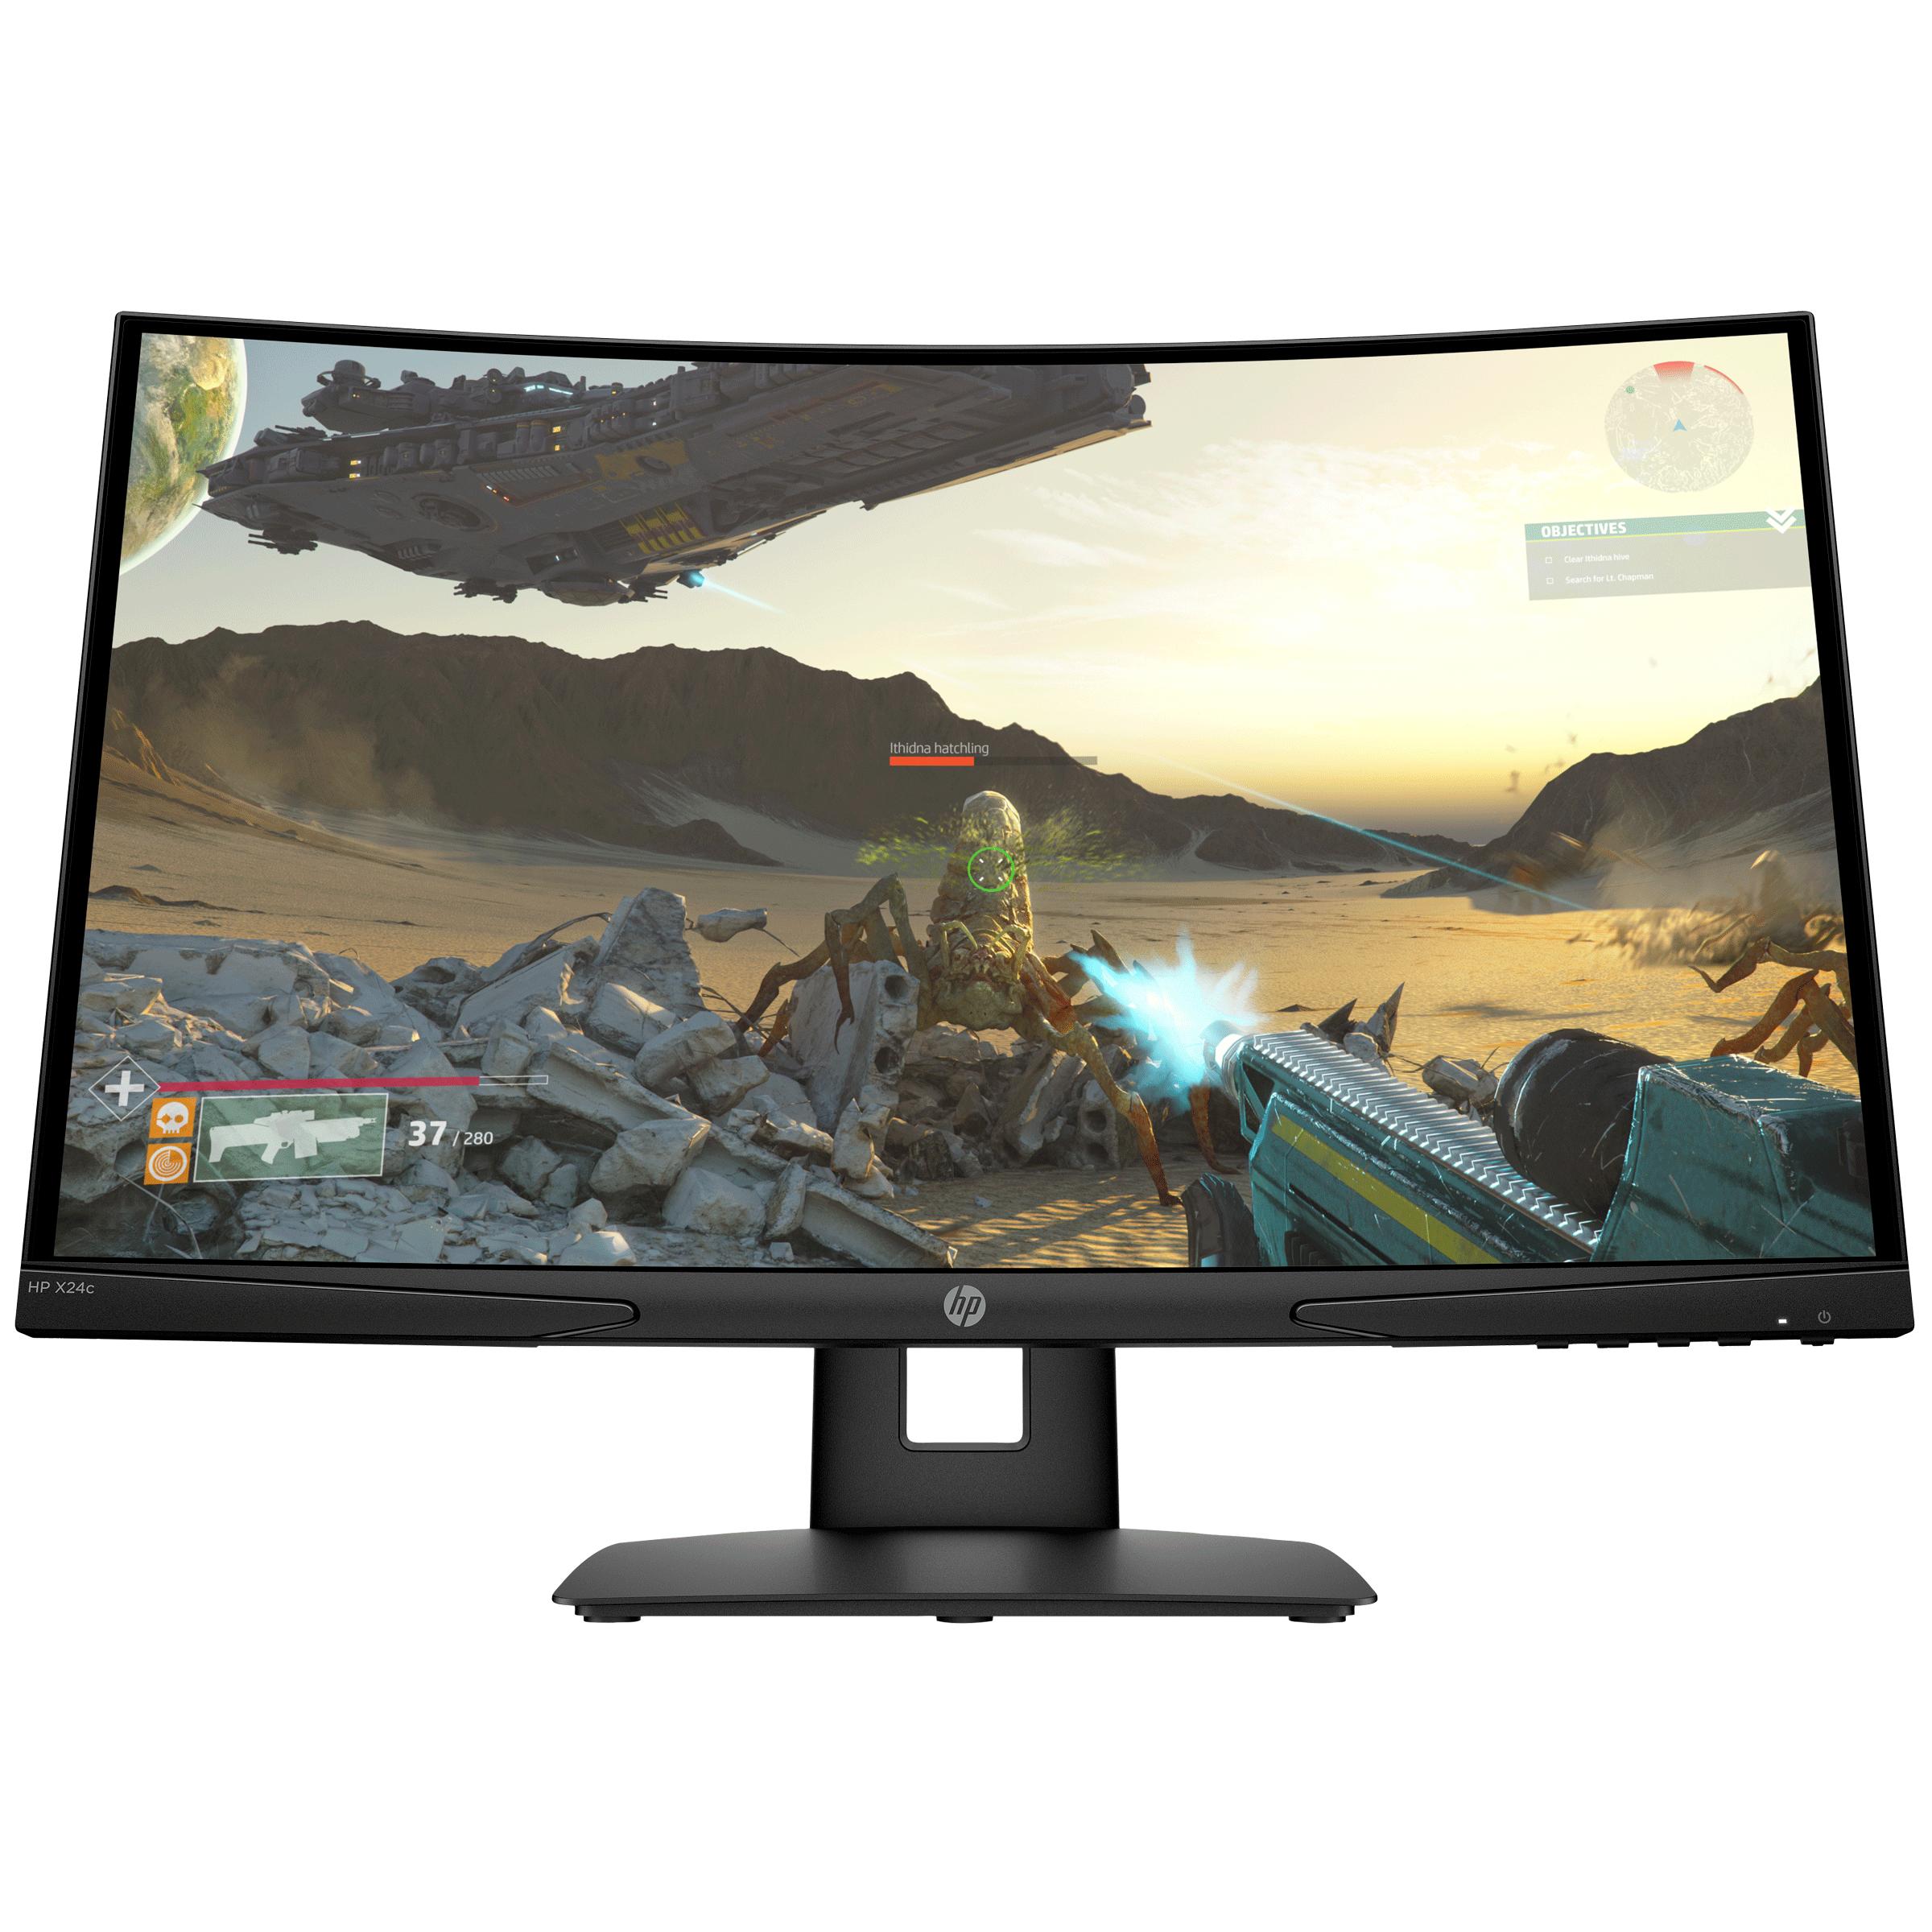 HP X24C 59.94cm (23.6 Inches) Full HD LED-Backlit Gaming Monitor (AMD FreeSync Technology, HDMI + DisplayPort, 144 Hz, 13Q95AA, Black)_1